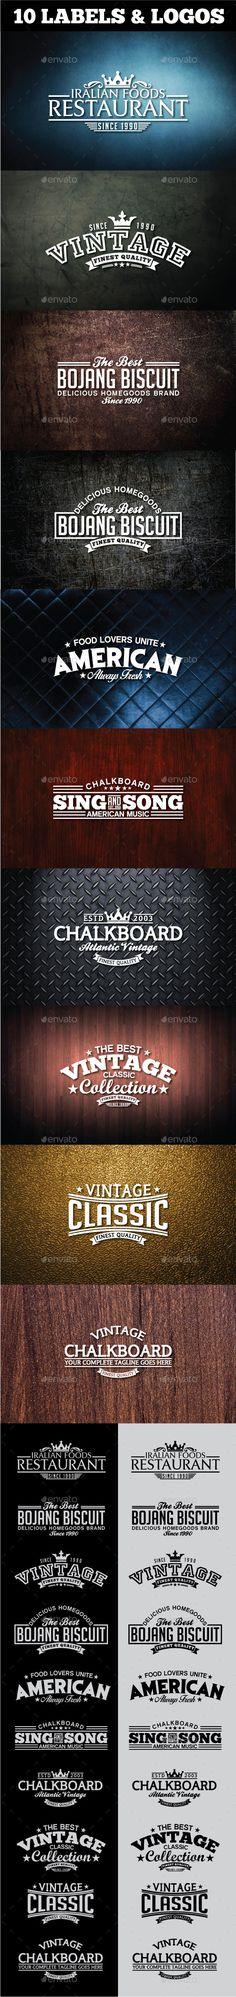 Retro Vintage Logotypes and Stickers #design Download: http://graphicriver.net/item/retro-vintage-logotypes-and-stickers/11515108?ref=ksioks